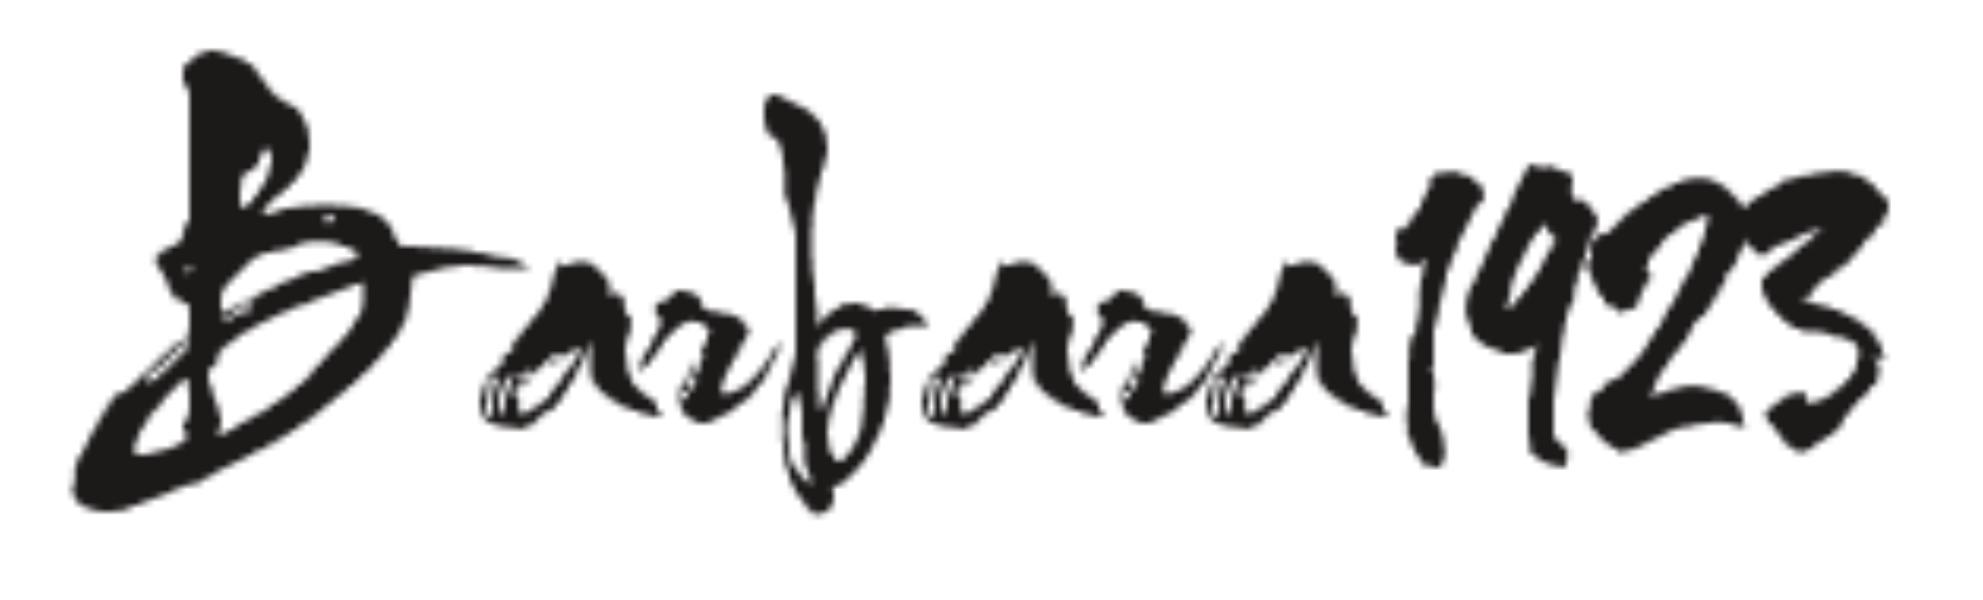 Barbara Onianwah's Signature